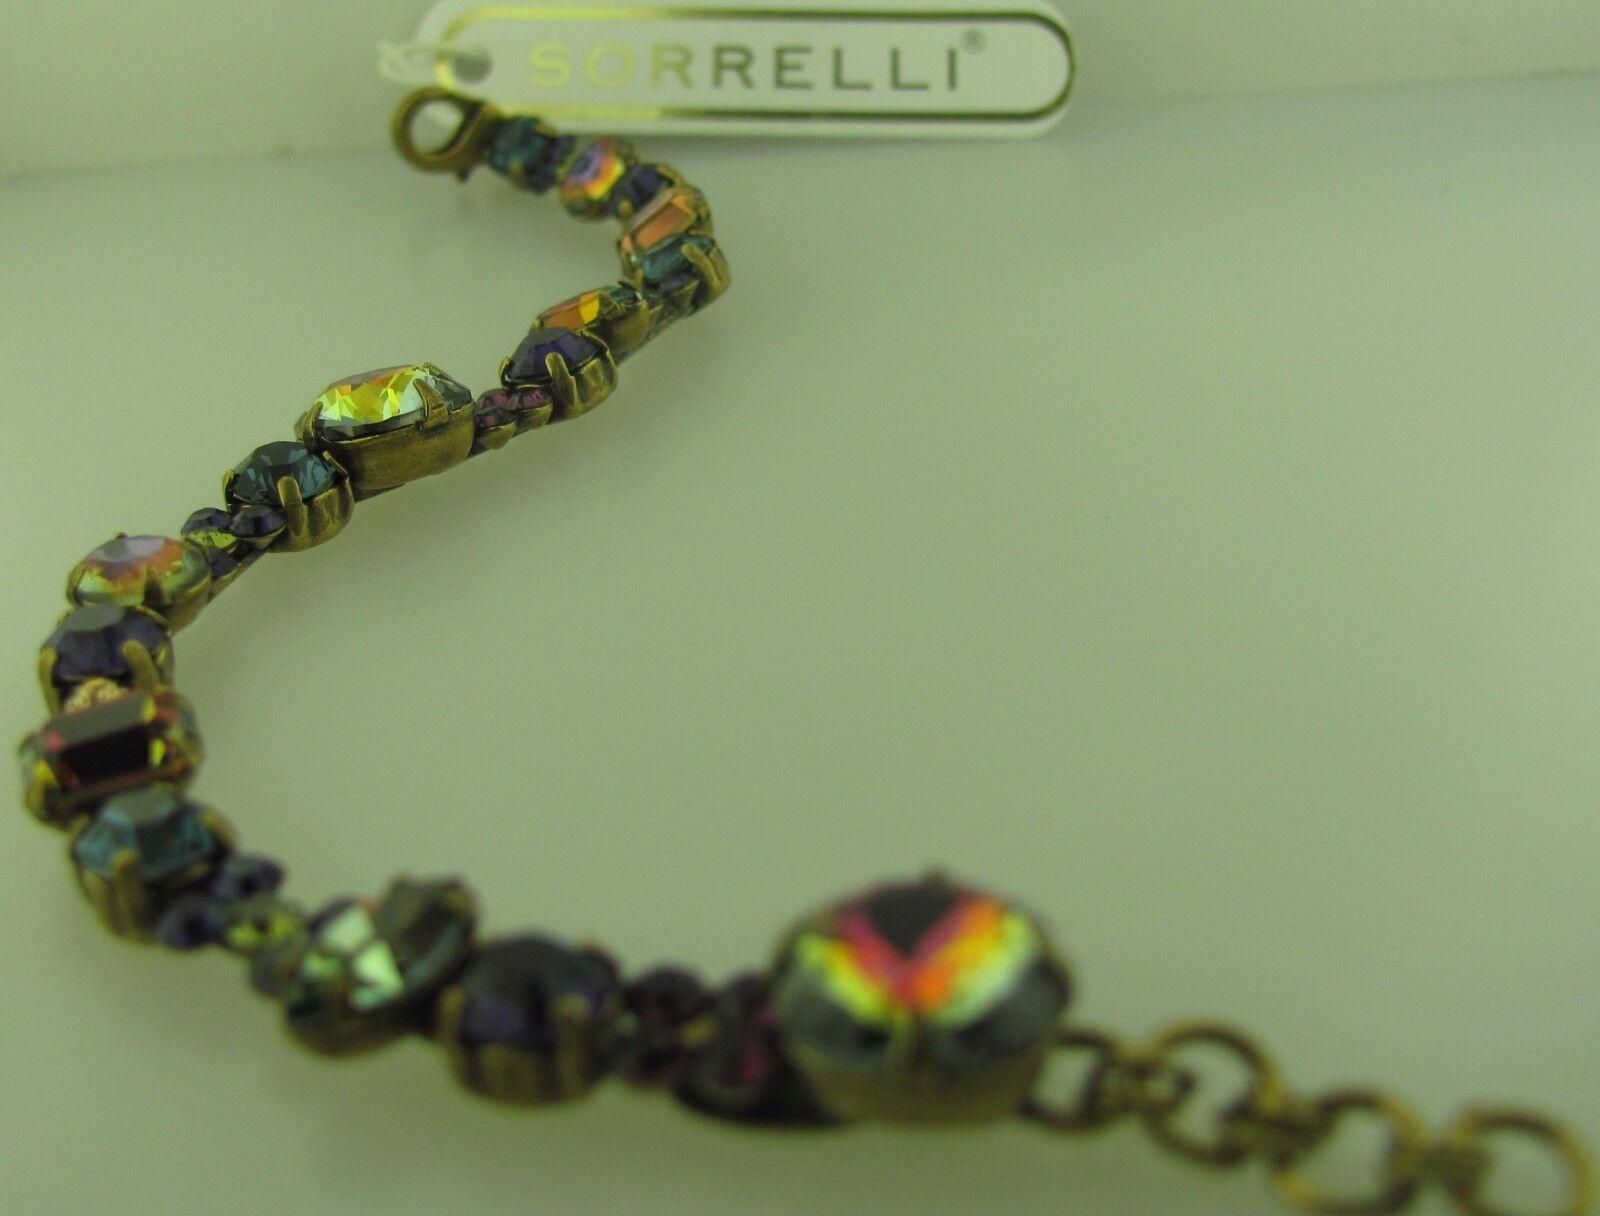 Sorrelli Vibrant Jewel Tone Core Collectn Bracelet BCD2AGVJT Antique gold tone